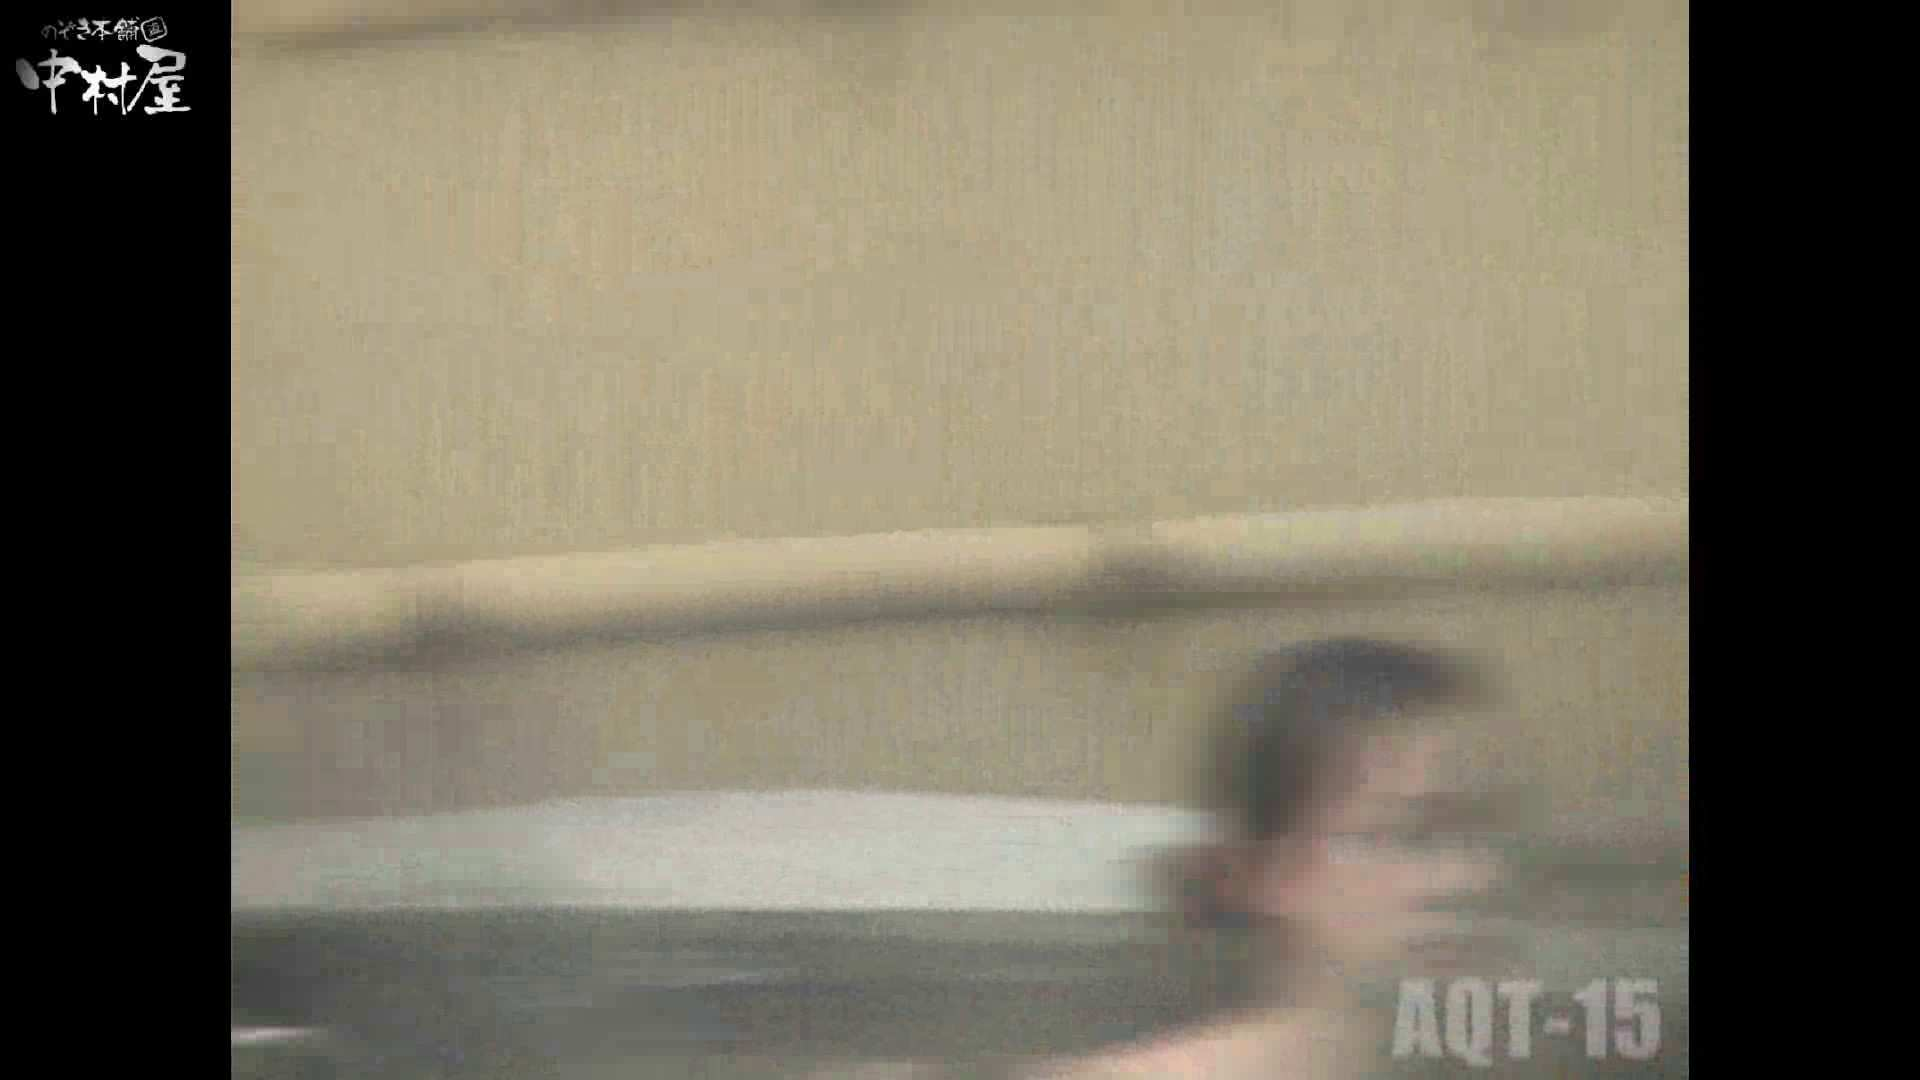 Aquaな露天風呂Vol.878潜入盗撮露天風呂十五判湯 其の八 潜入  96PIX 87